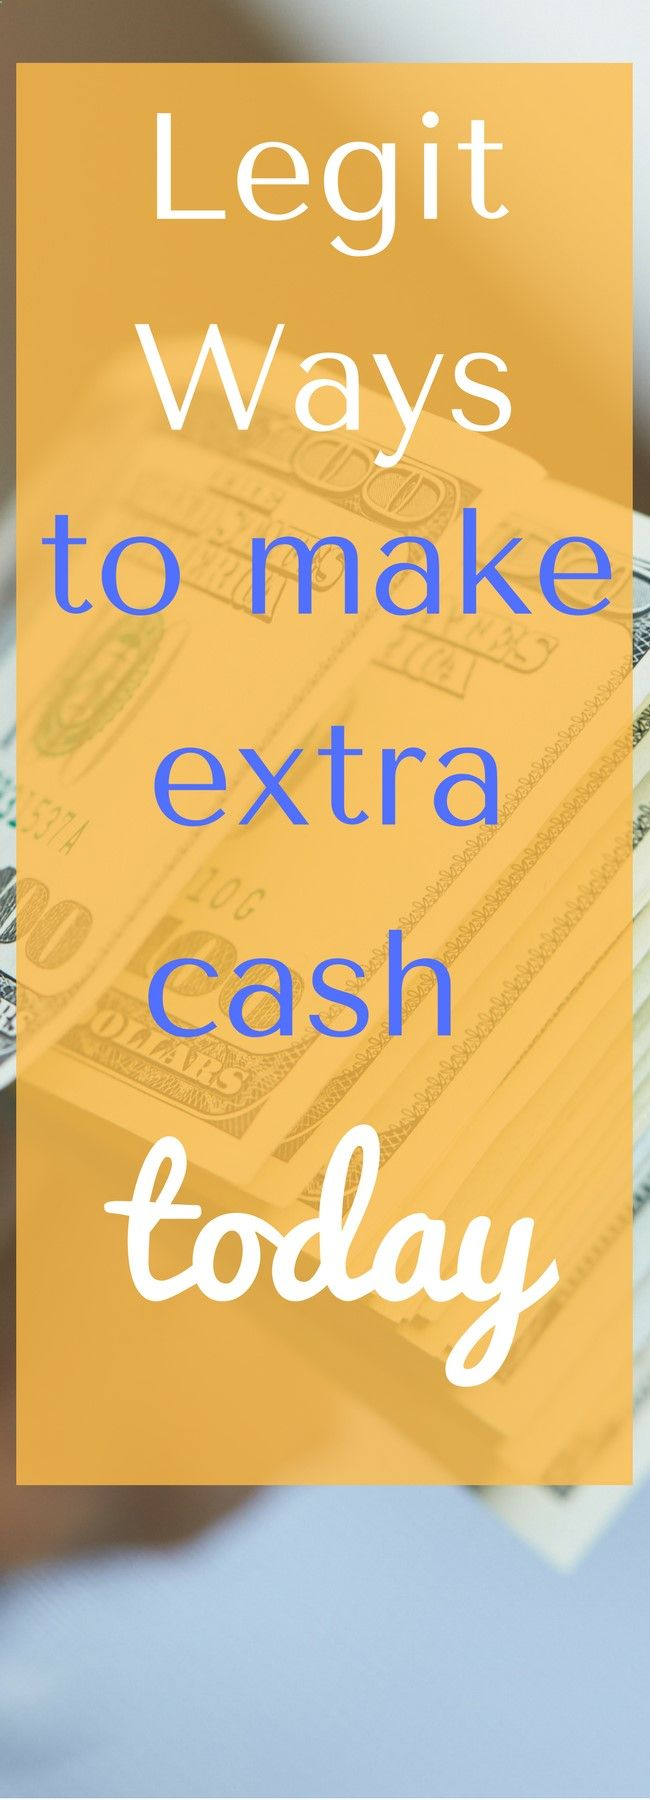 Ga payday loans image 7